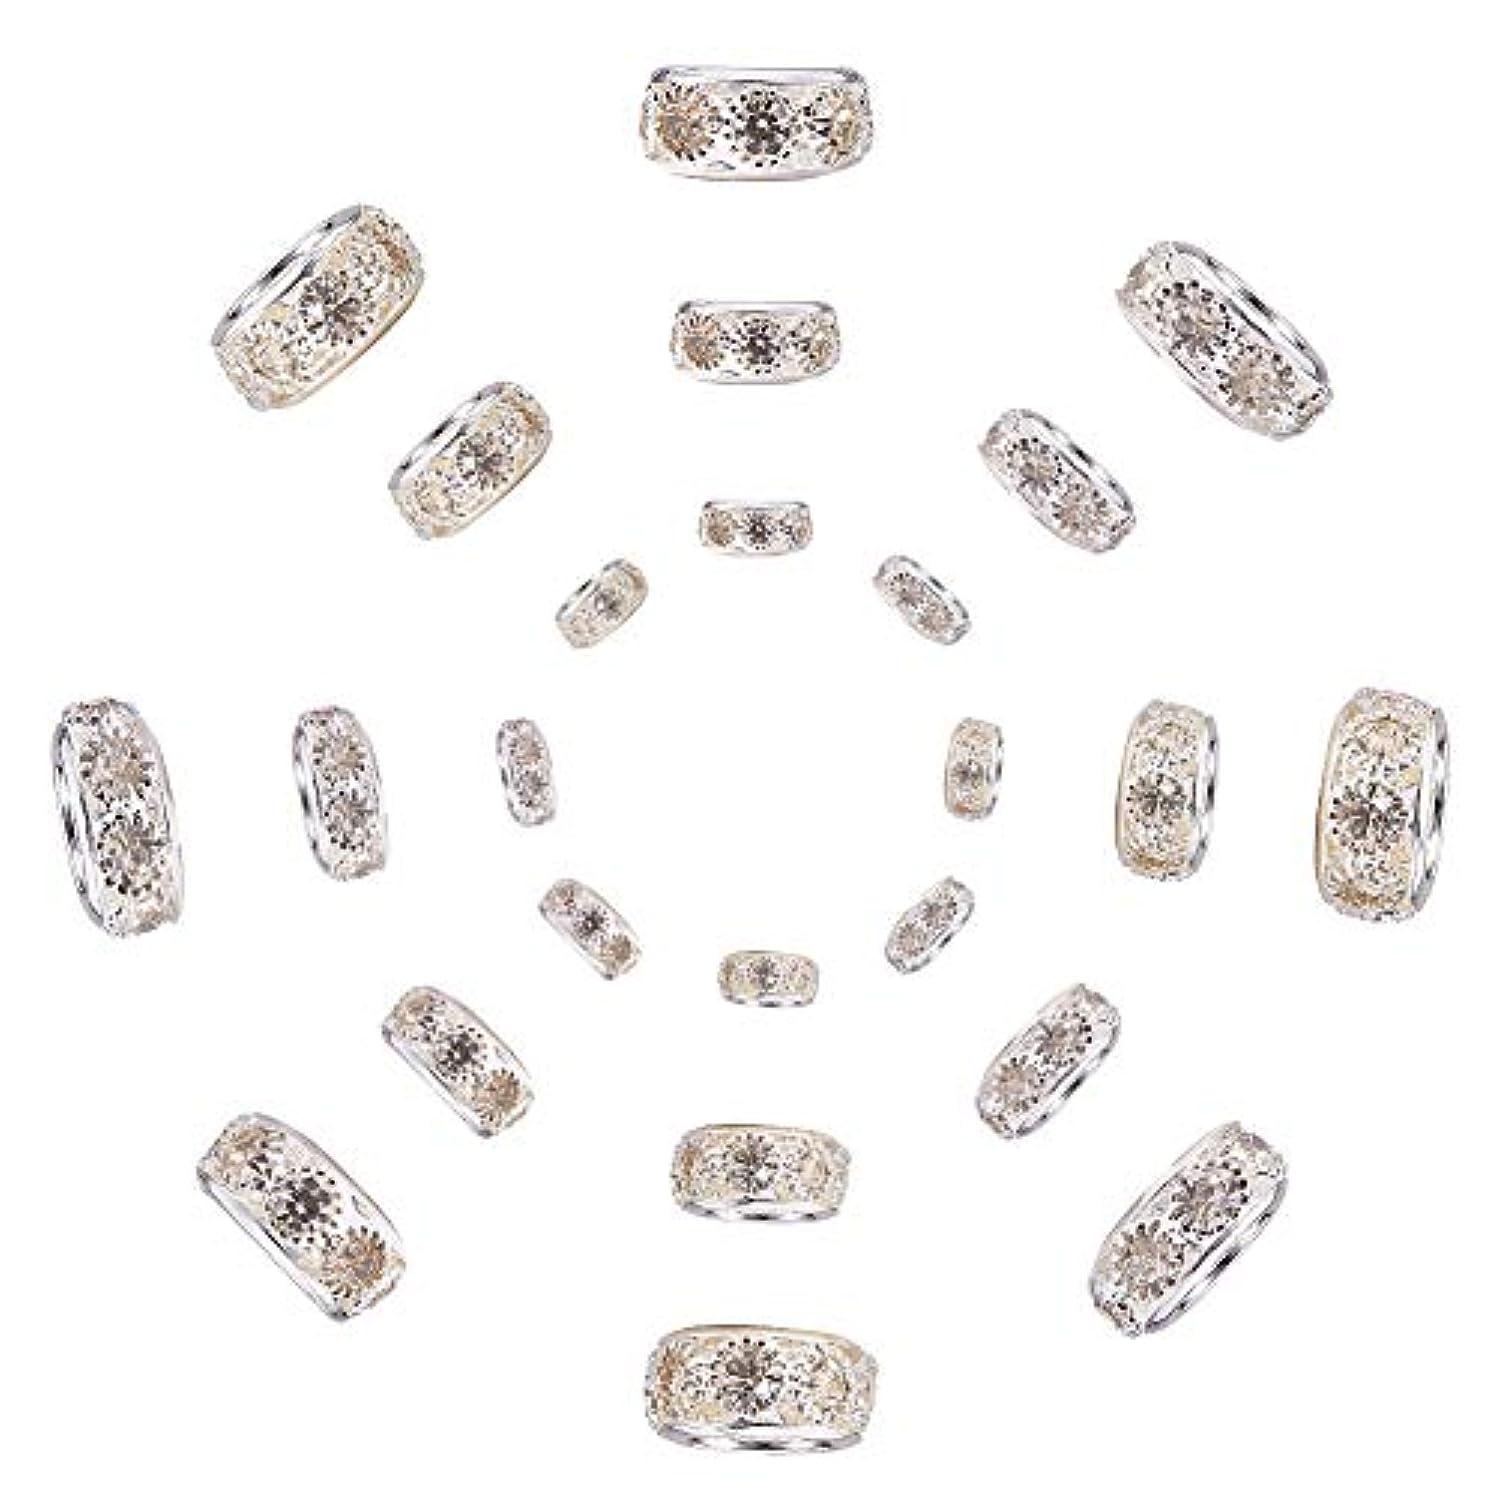 PandaHall Elite 15 Pcs Brass European Beads Crystal Rhinestone Rondelle Large Hole Bead Diameter 10mm 12mm 14mm Fit Snake Style Charm Bracelet